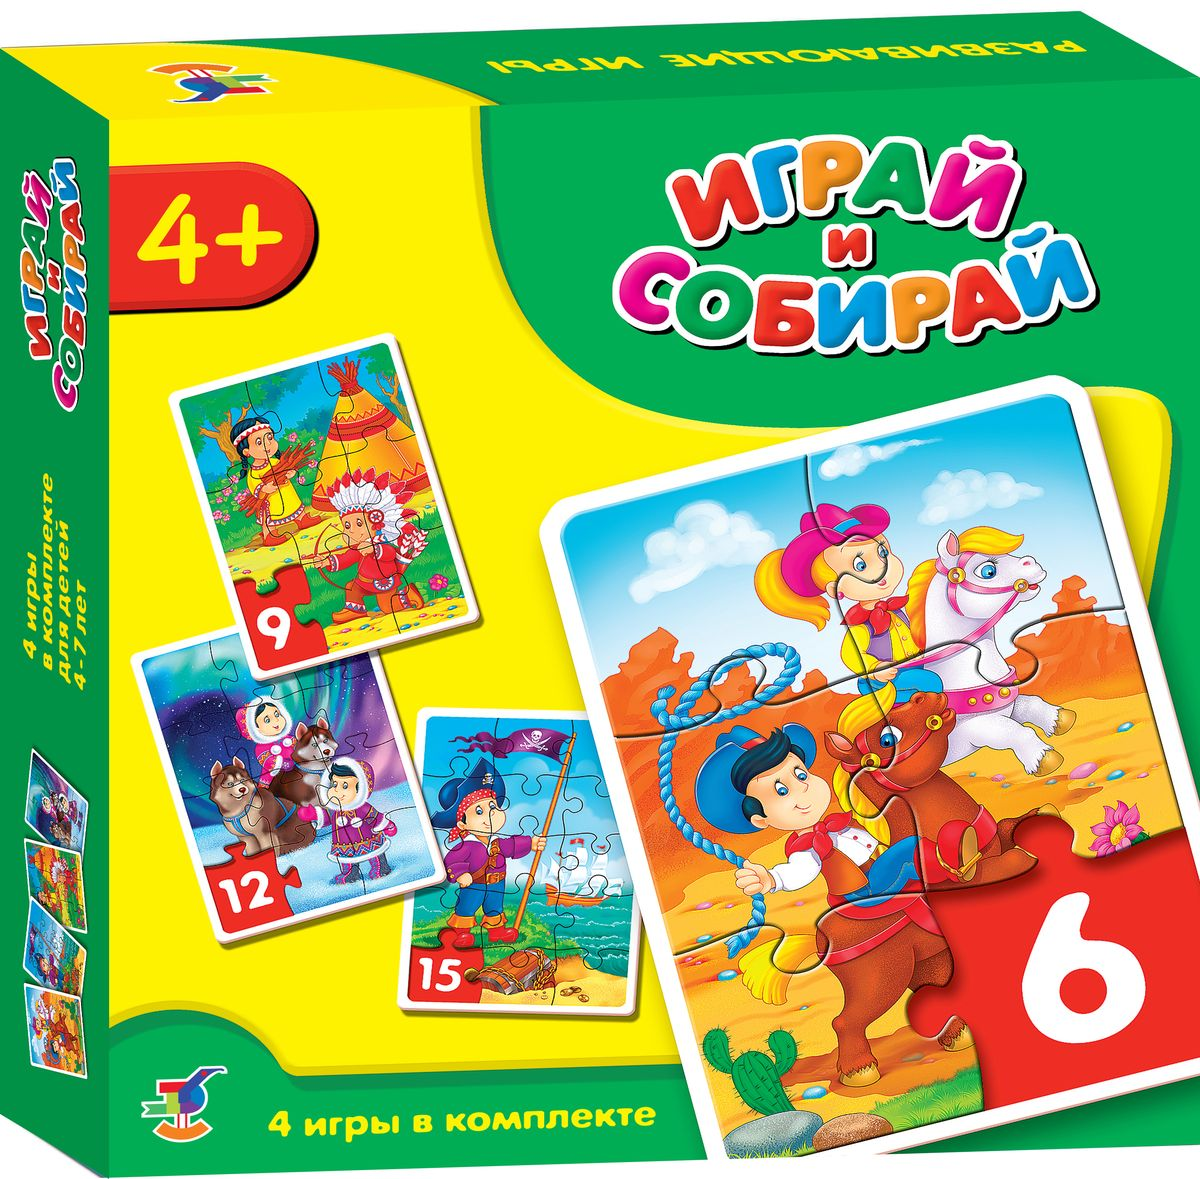 Дрофа-Медиа Пазл для малышей Играй и собирай 4 в 1 2939 дрофа медиа пазл для малышей играй и собирай 4 в 1 2938